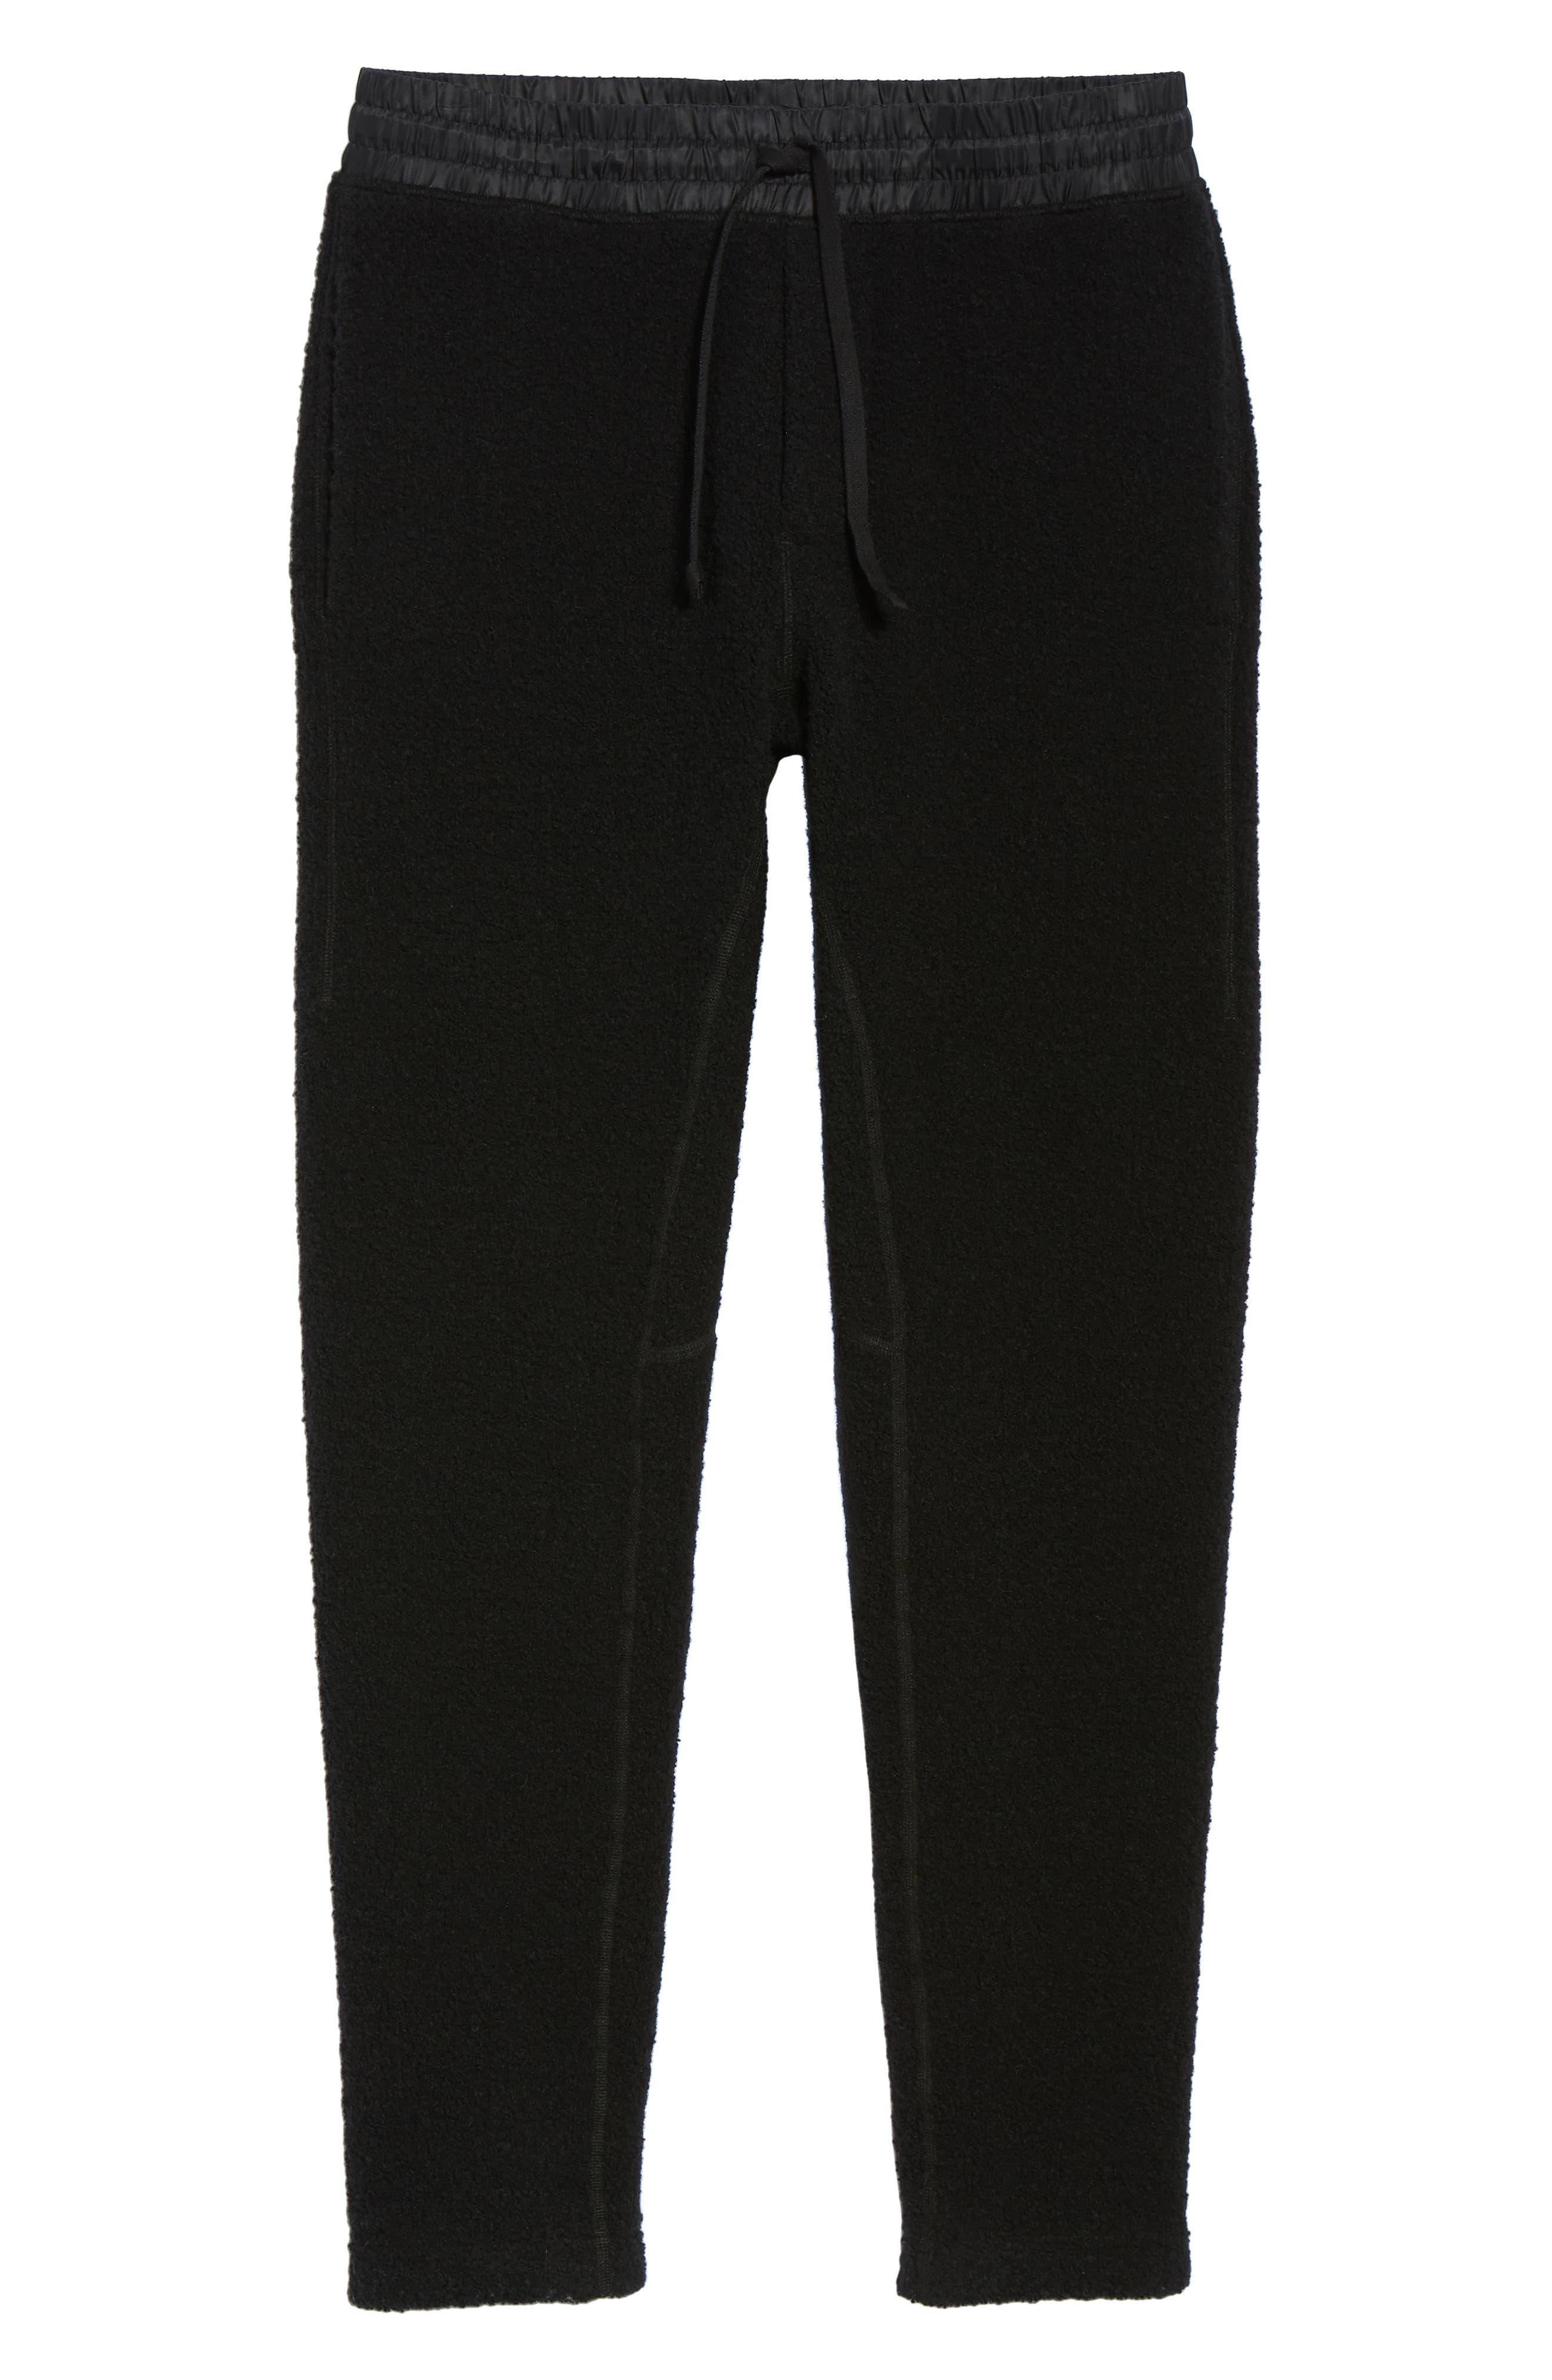 Tactical Fleece Pants,                             Alternate thumbnail 6, color,                             001